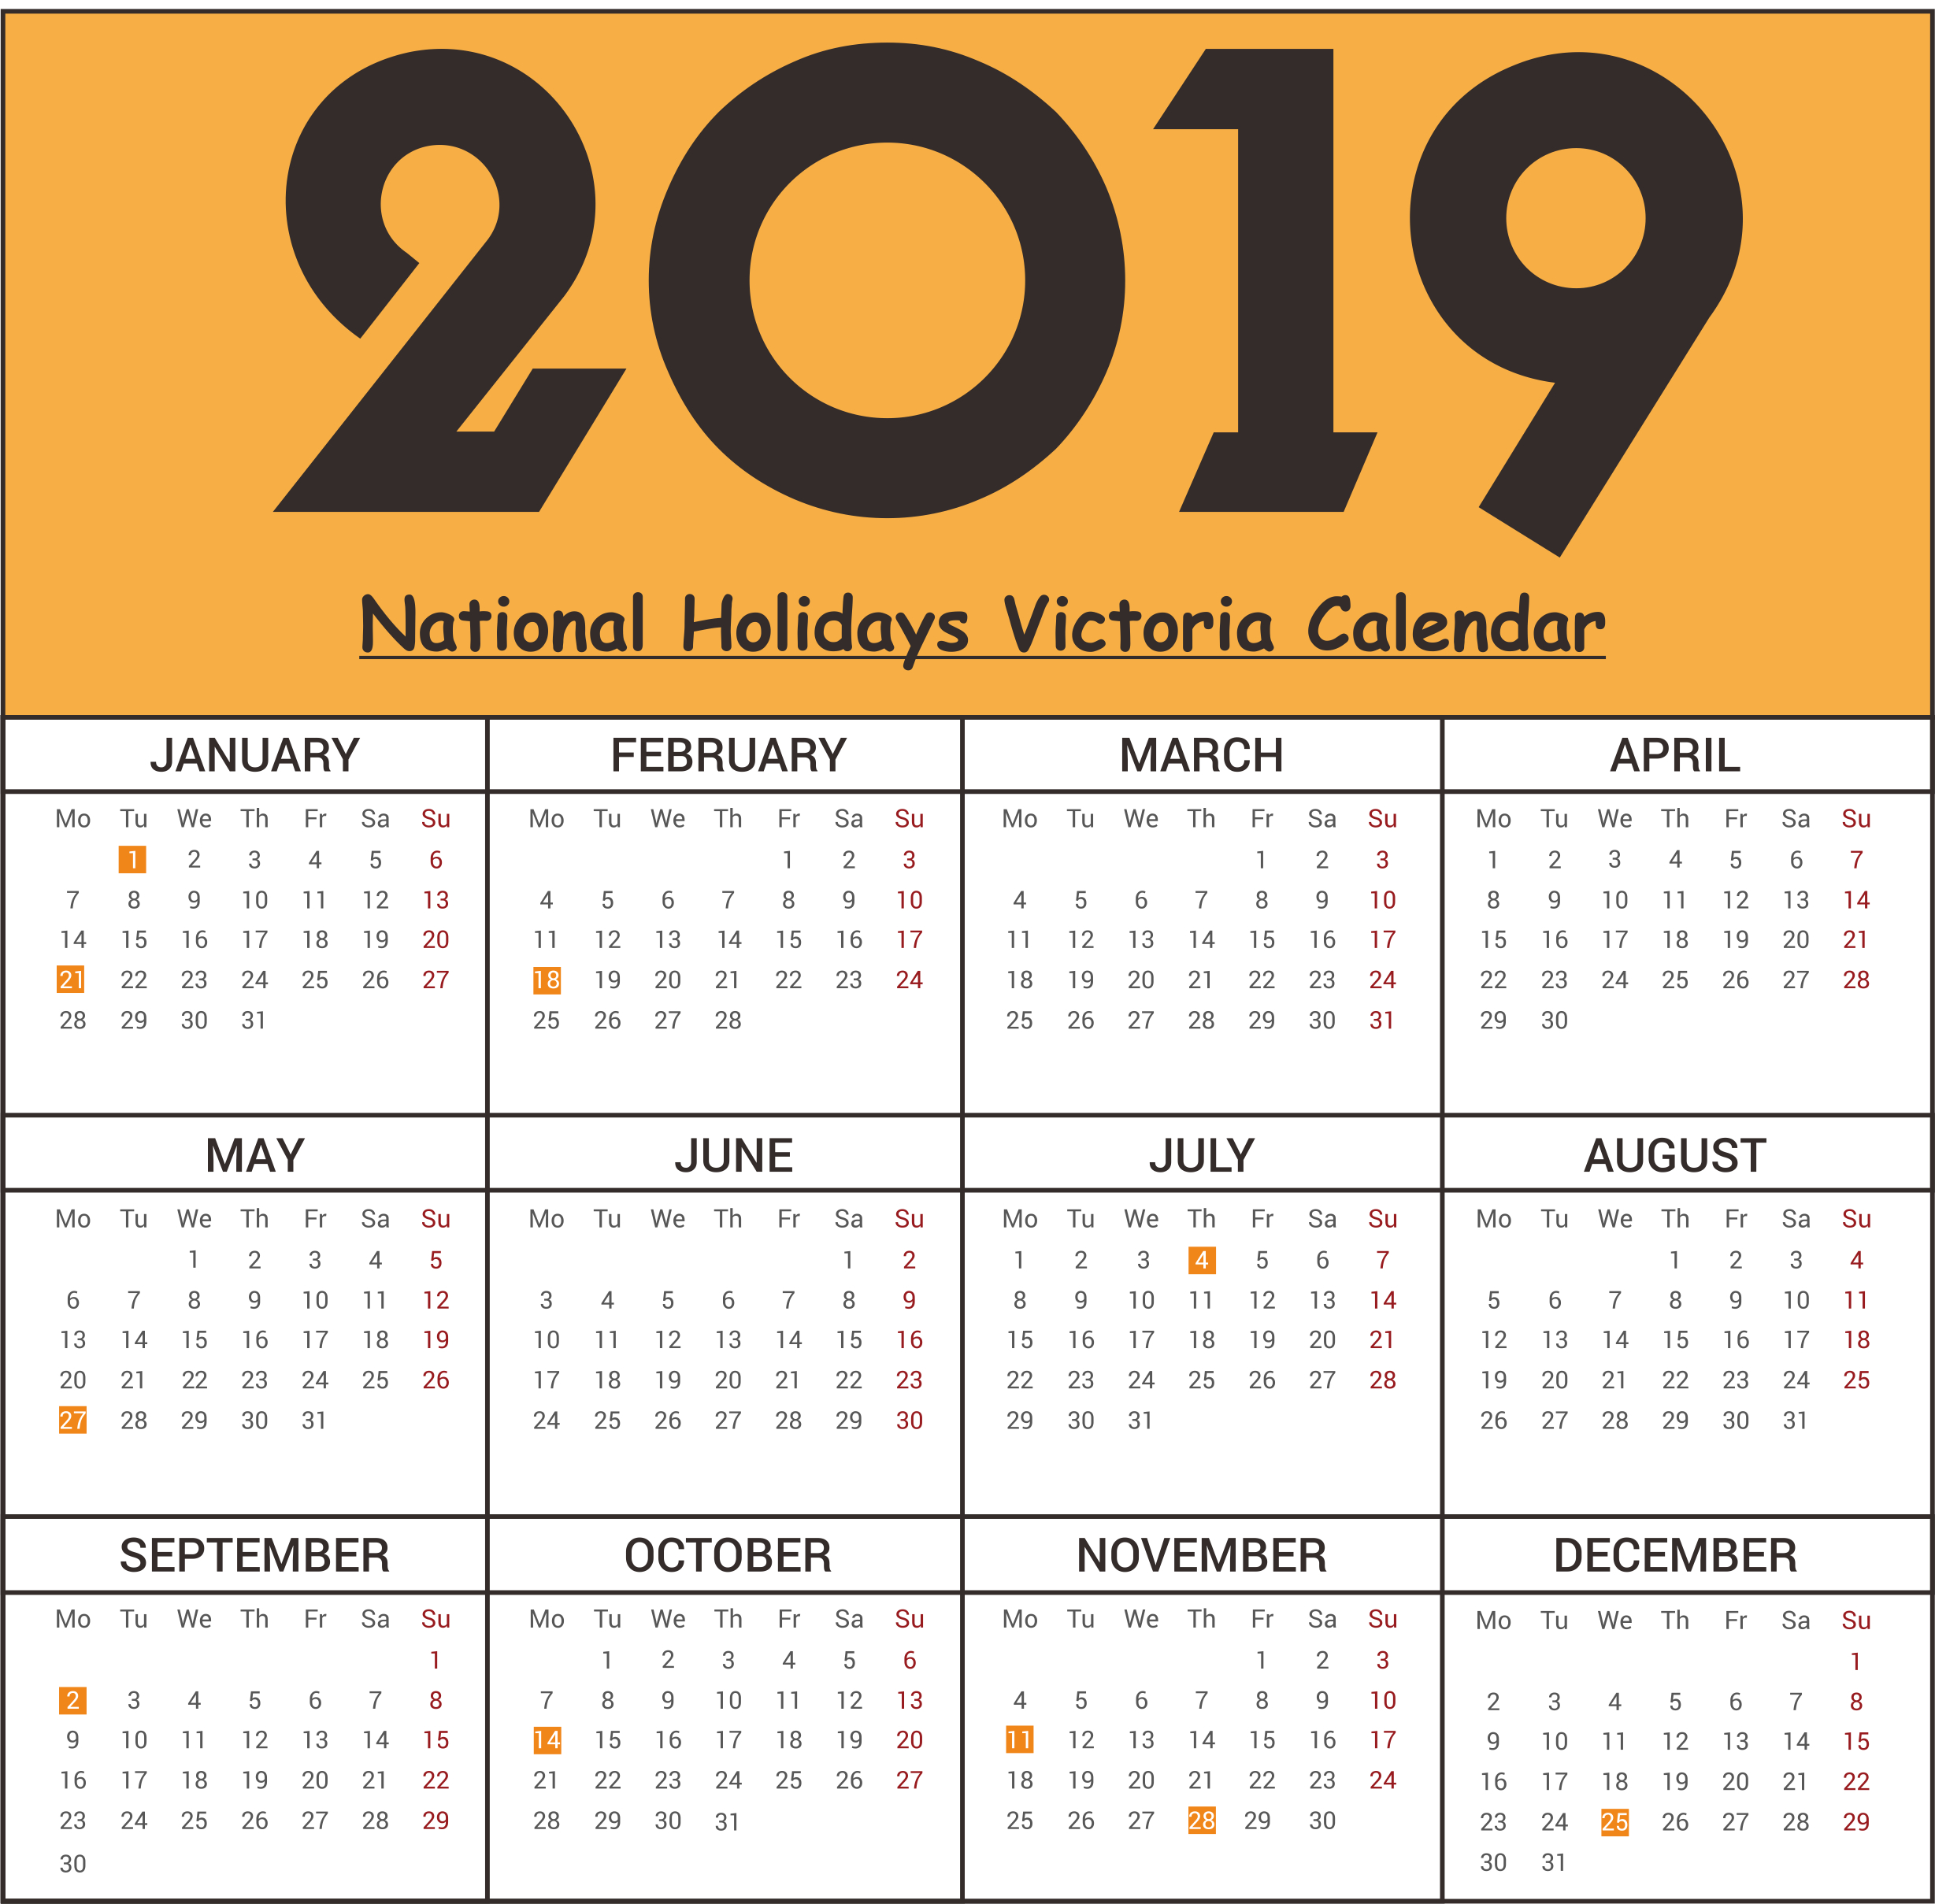 Free Victoria National Holidays 2019 Calendar Templates   Free Calendar 2019 Victoria School Holidays